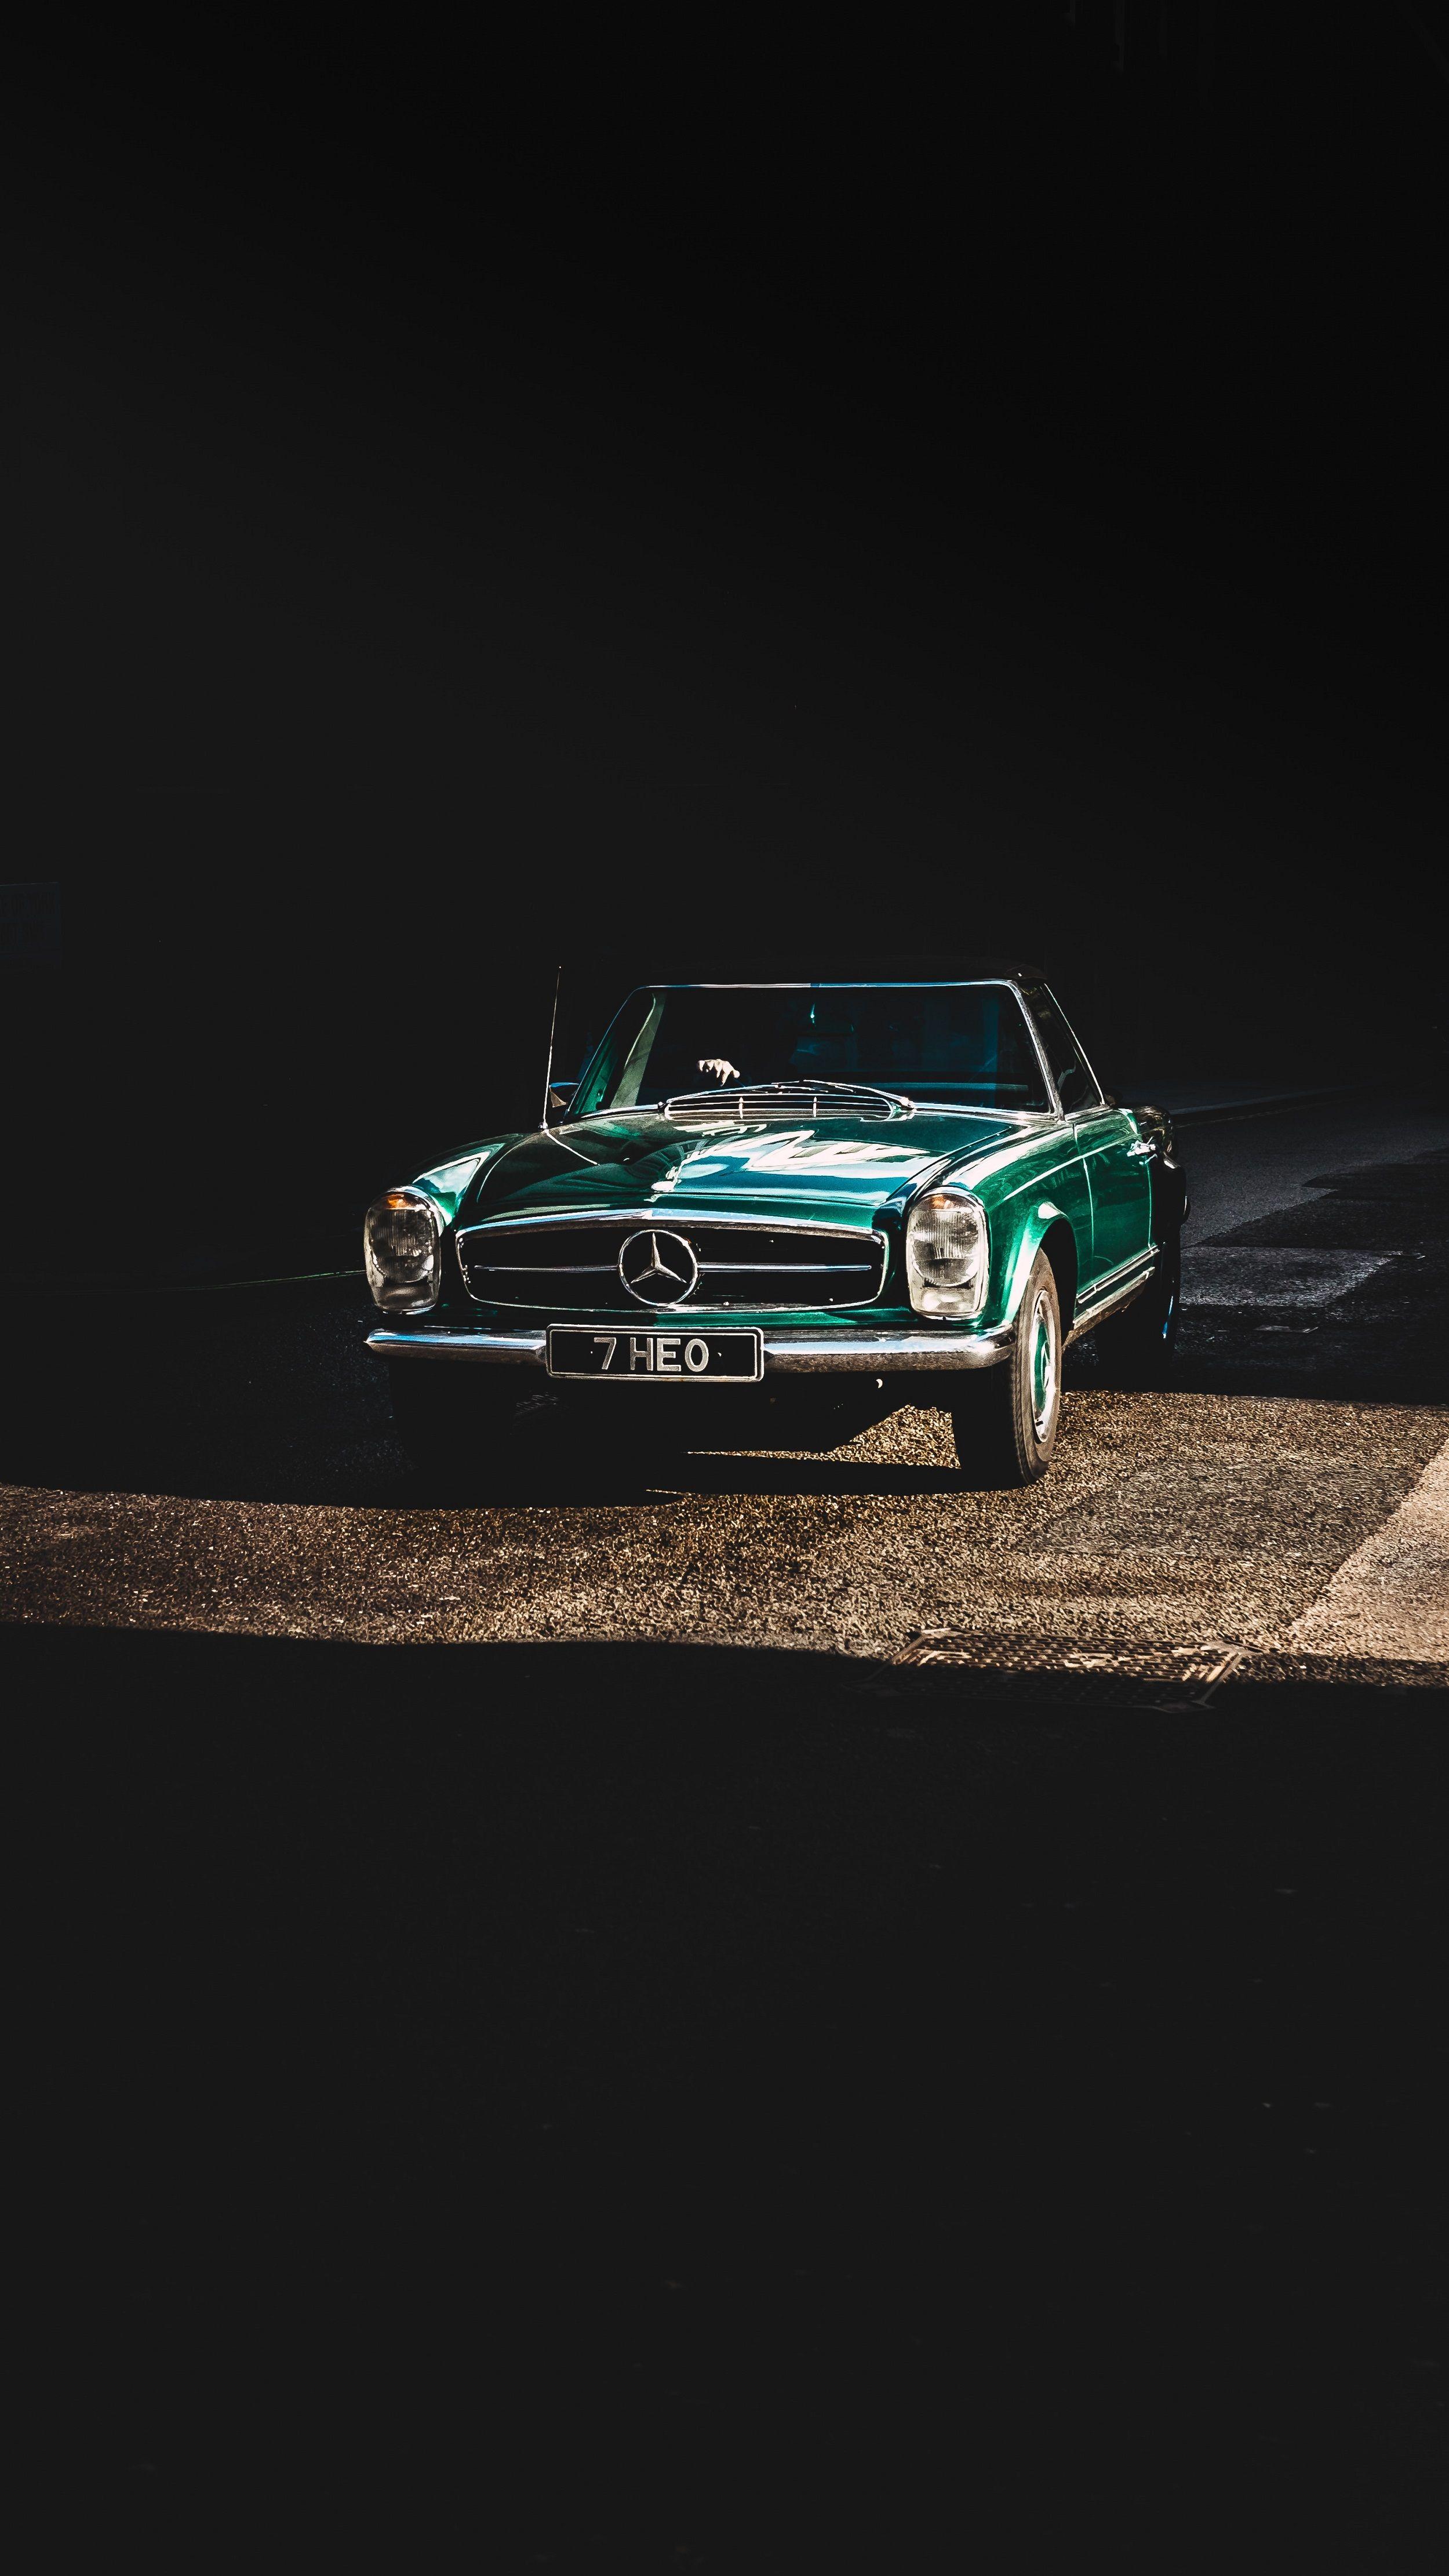 Classical Benz Mercedes Benz Coupe Car Wallpapers Car Iphone Wallpaper